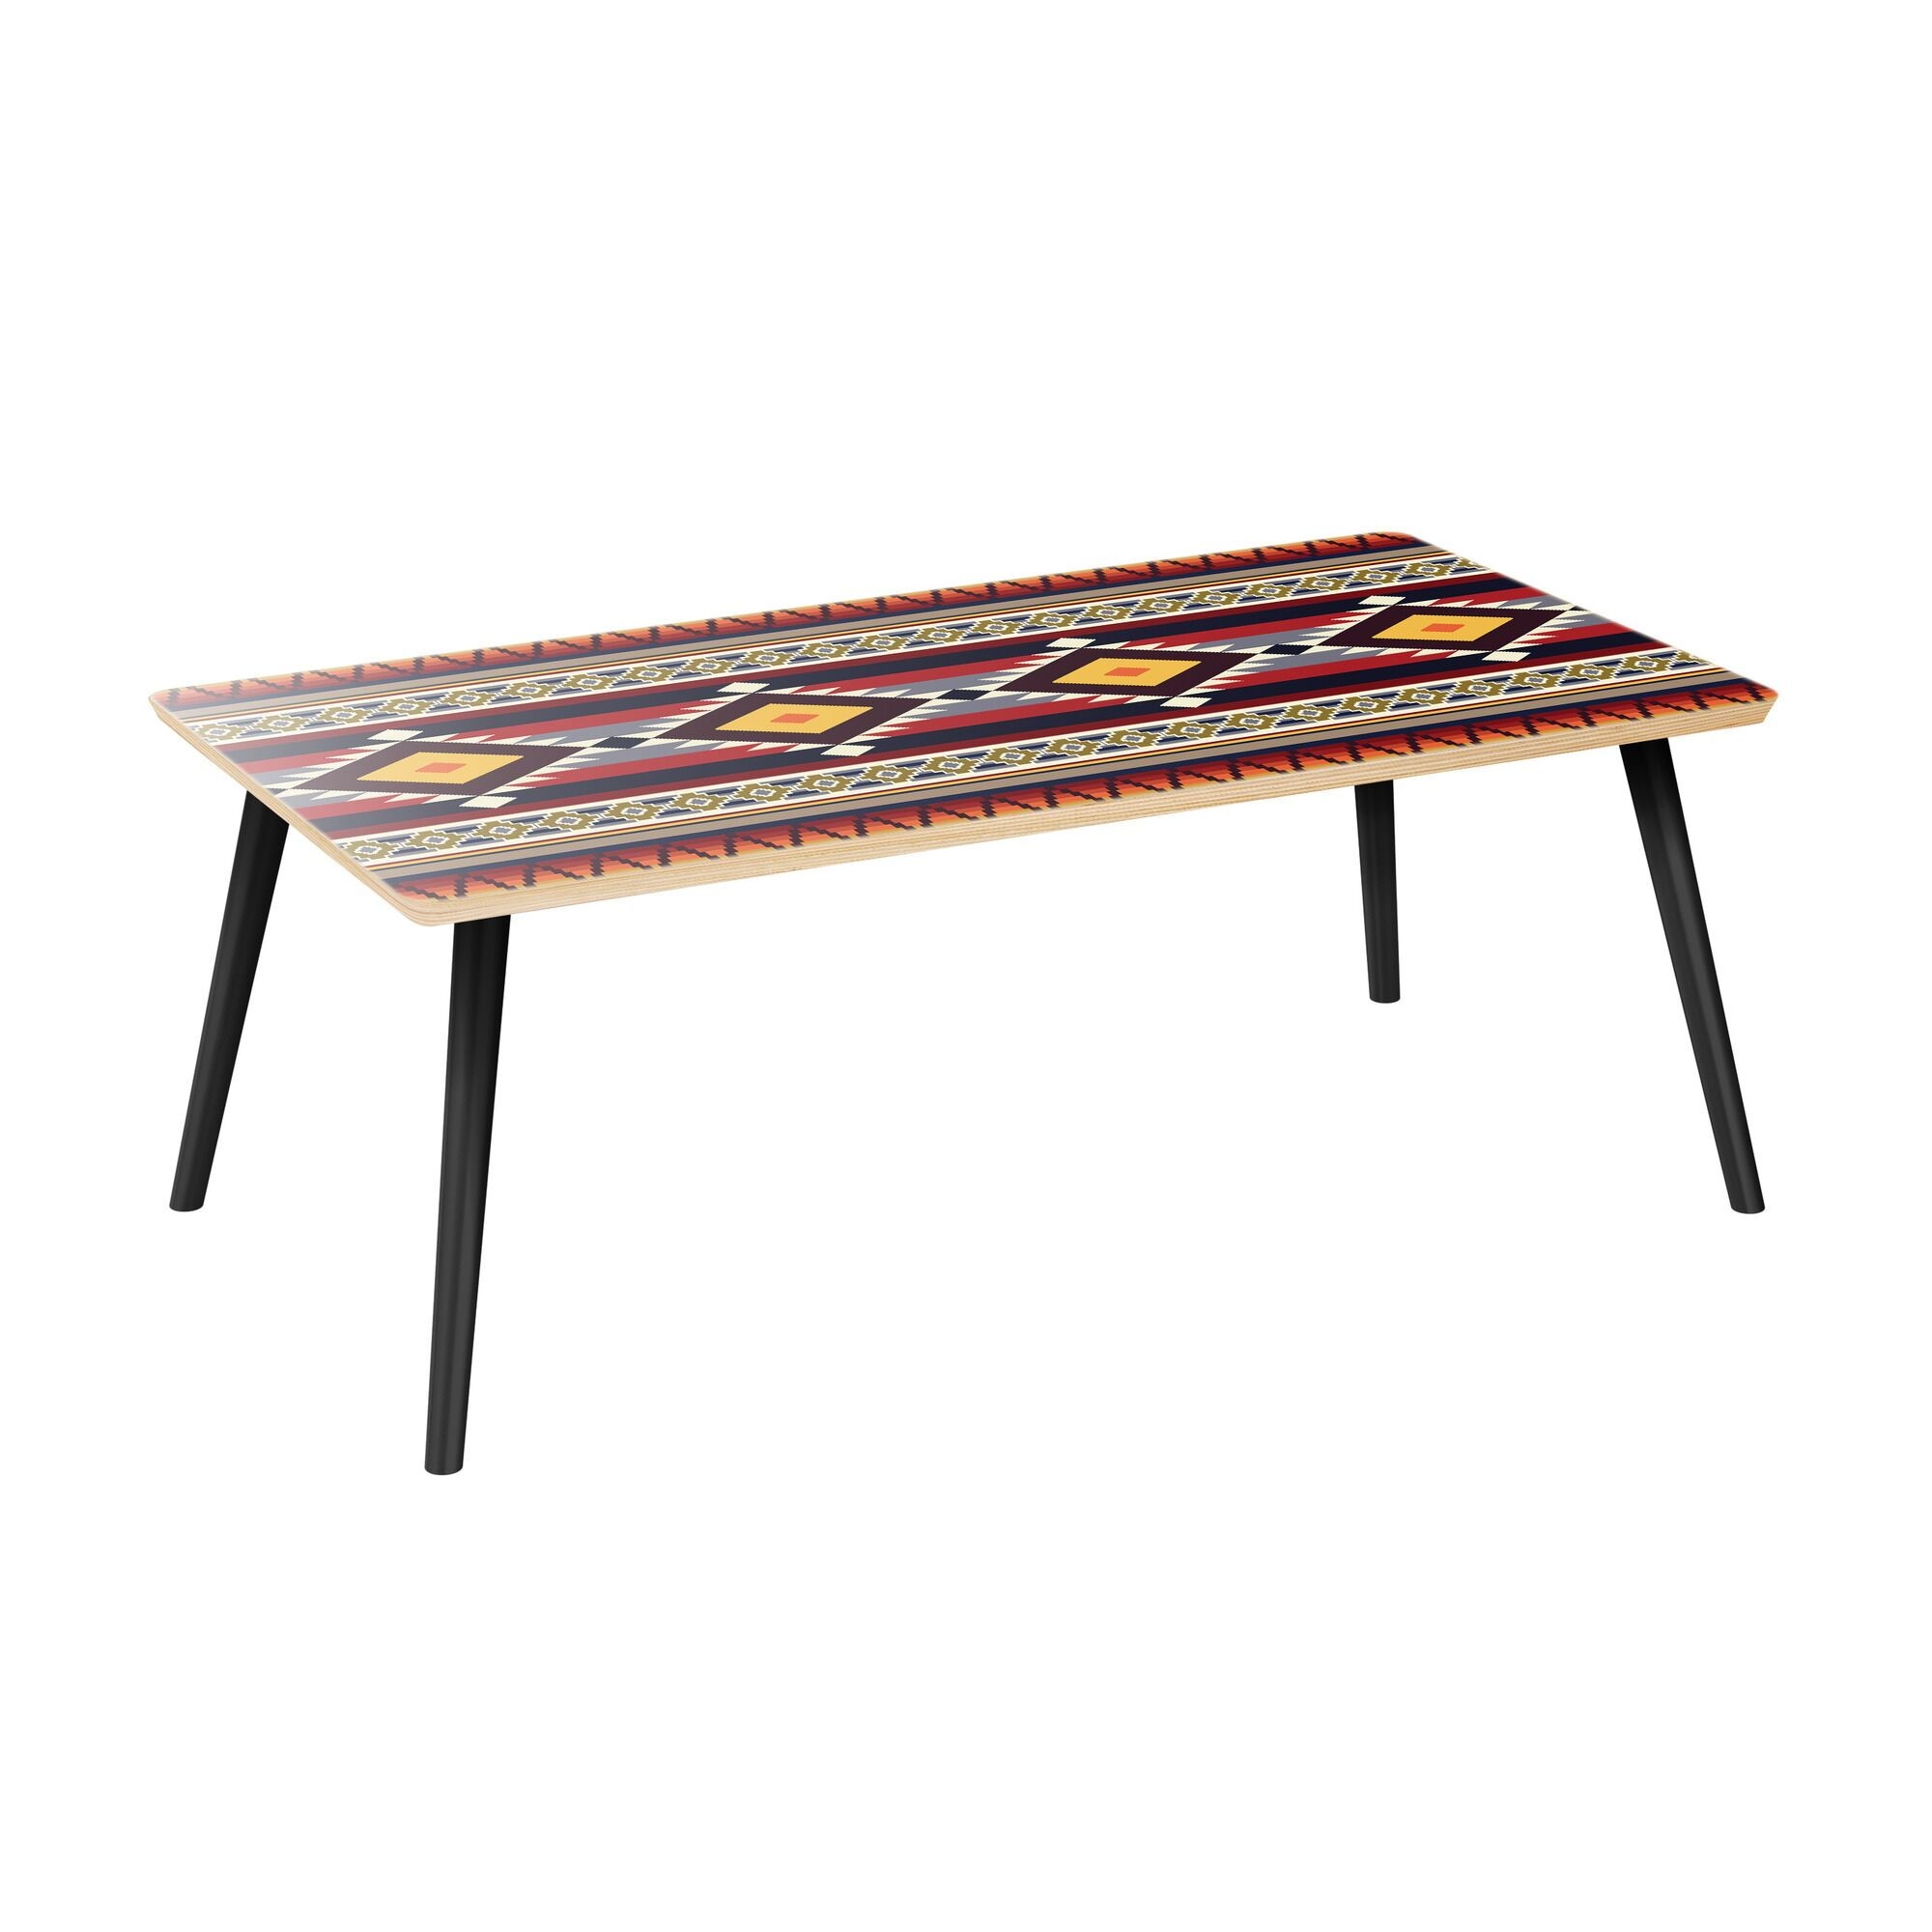 Kaytlynn Coffee Table Table Top Color: Natural, Table Base Color: Black